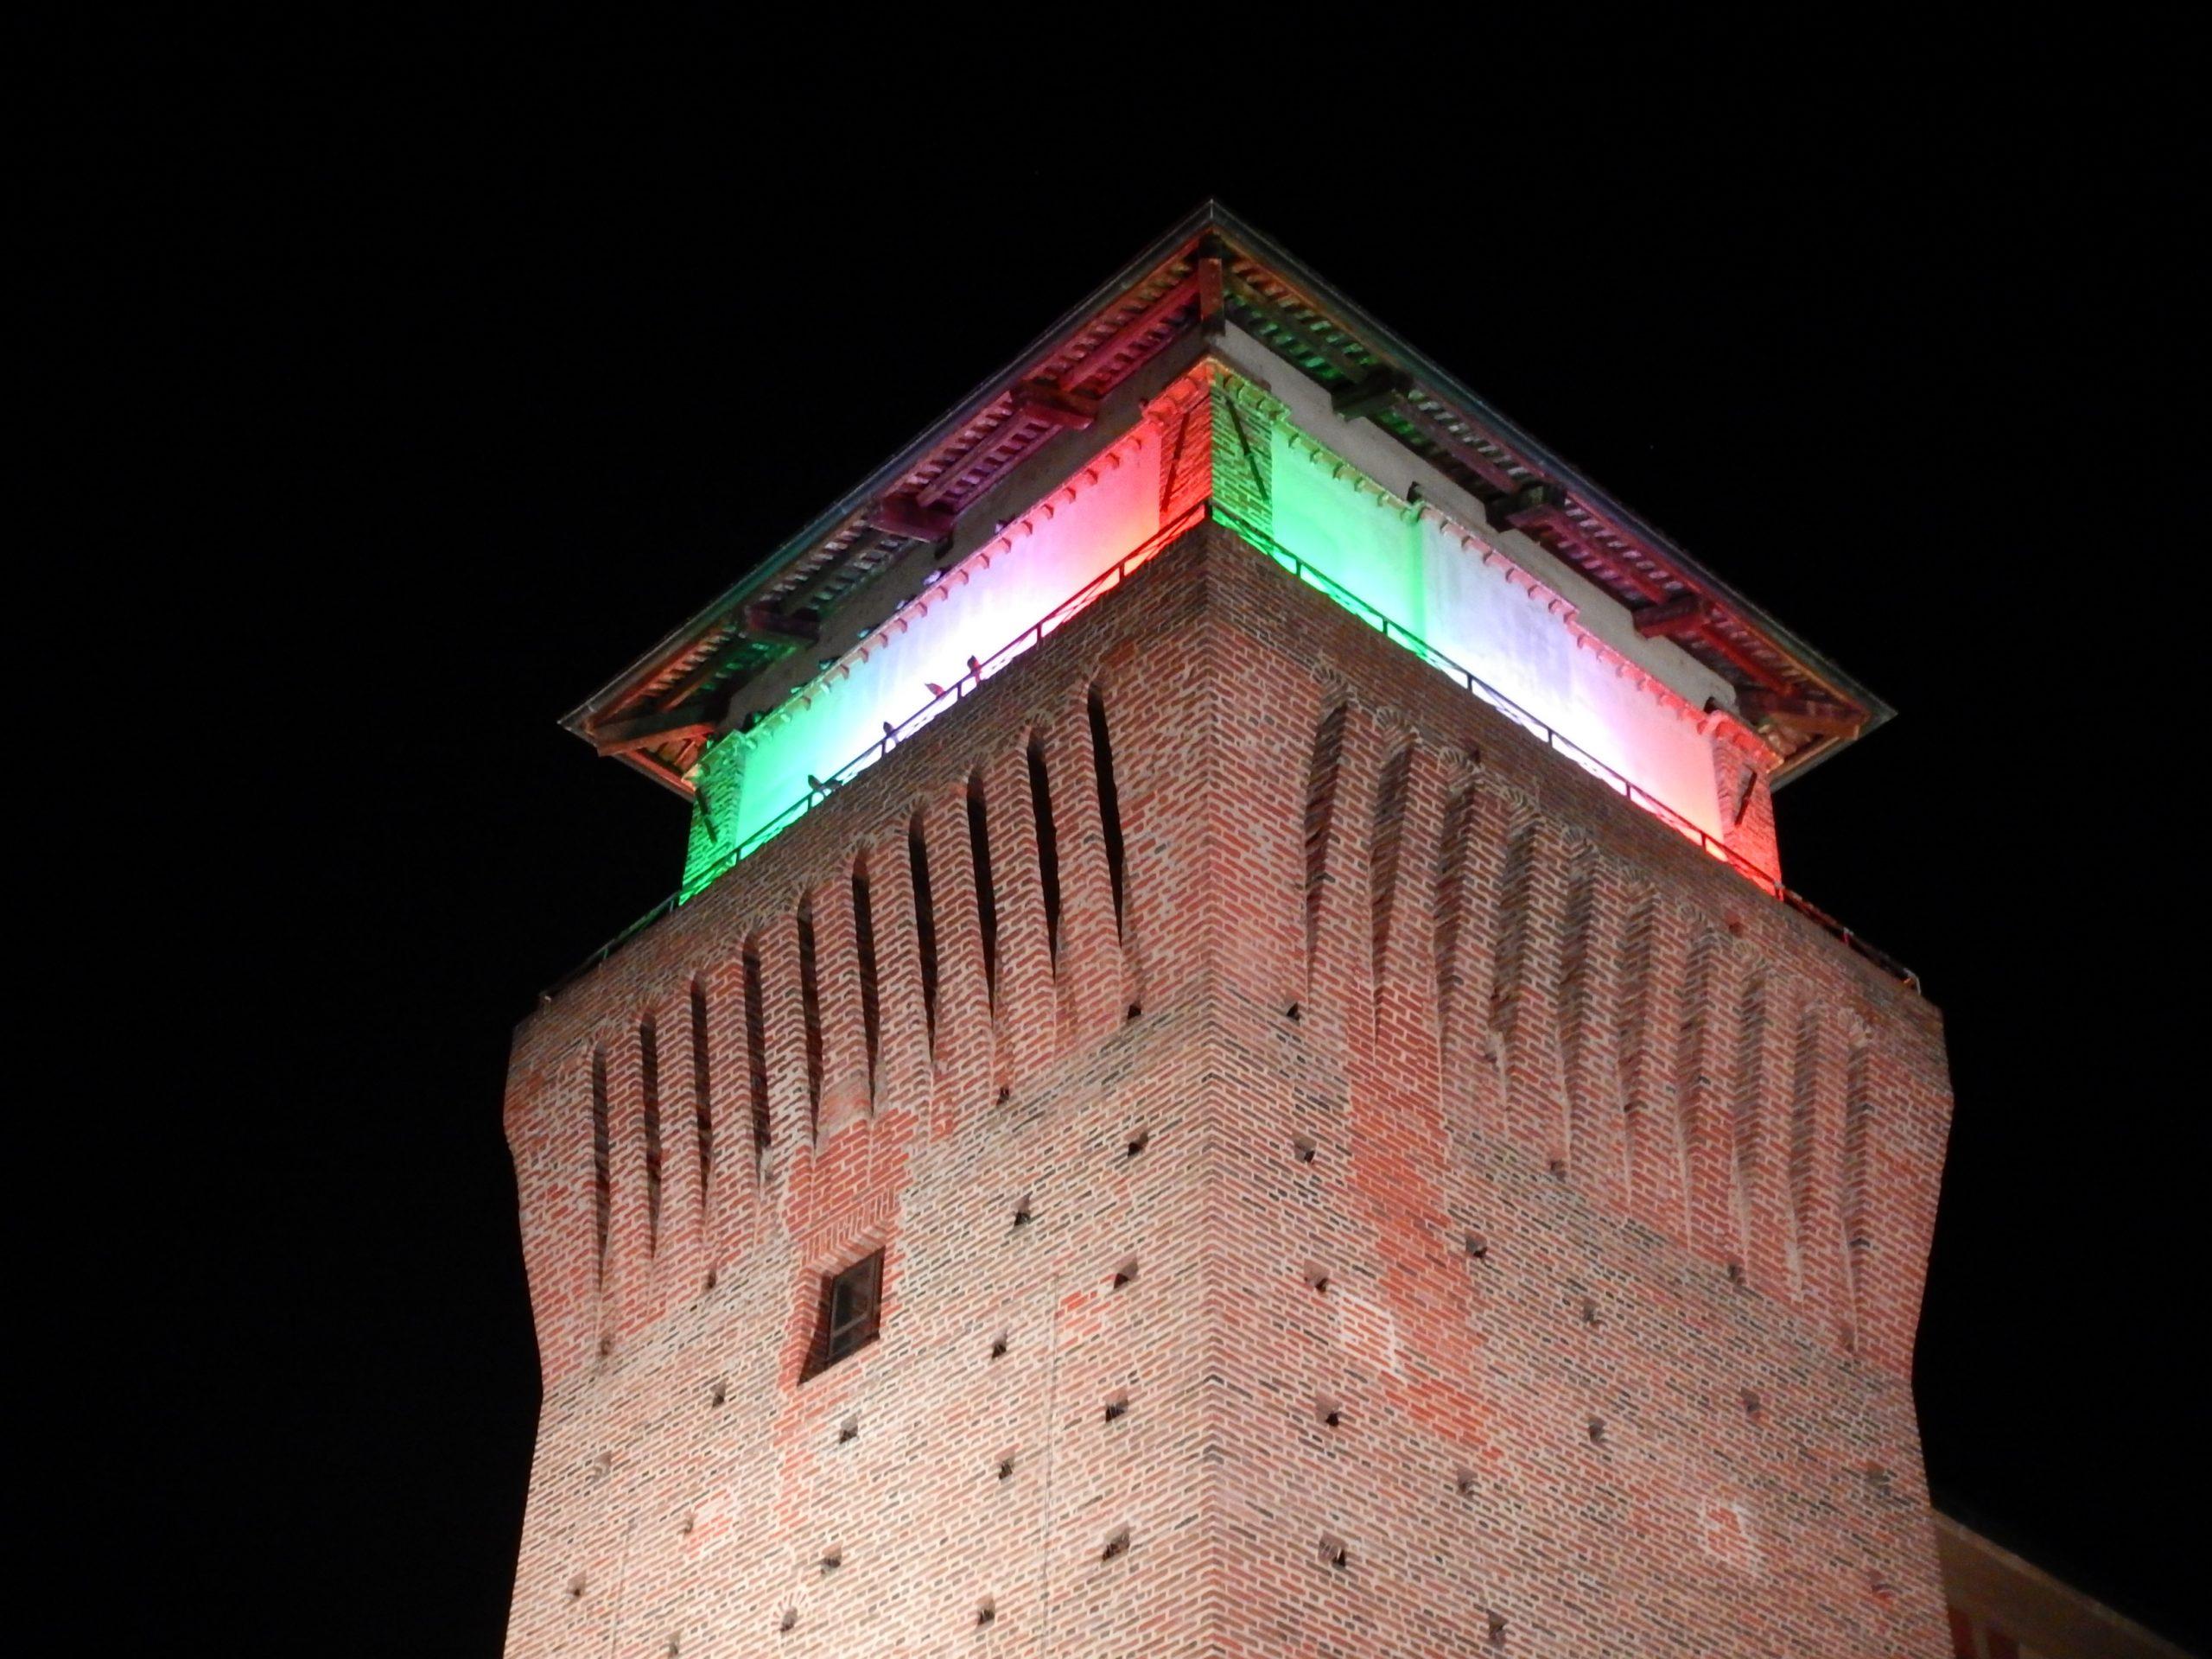 Torre di settimo torinese